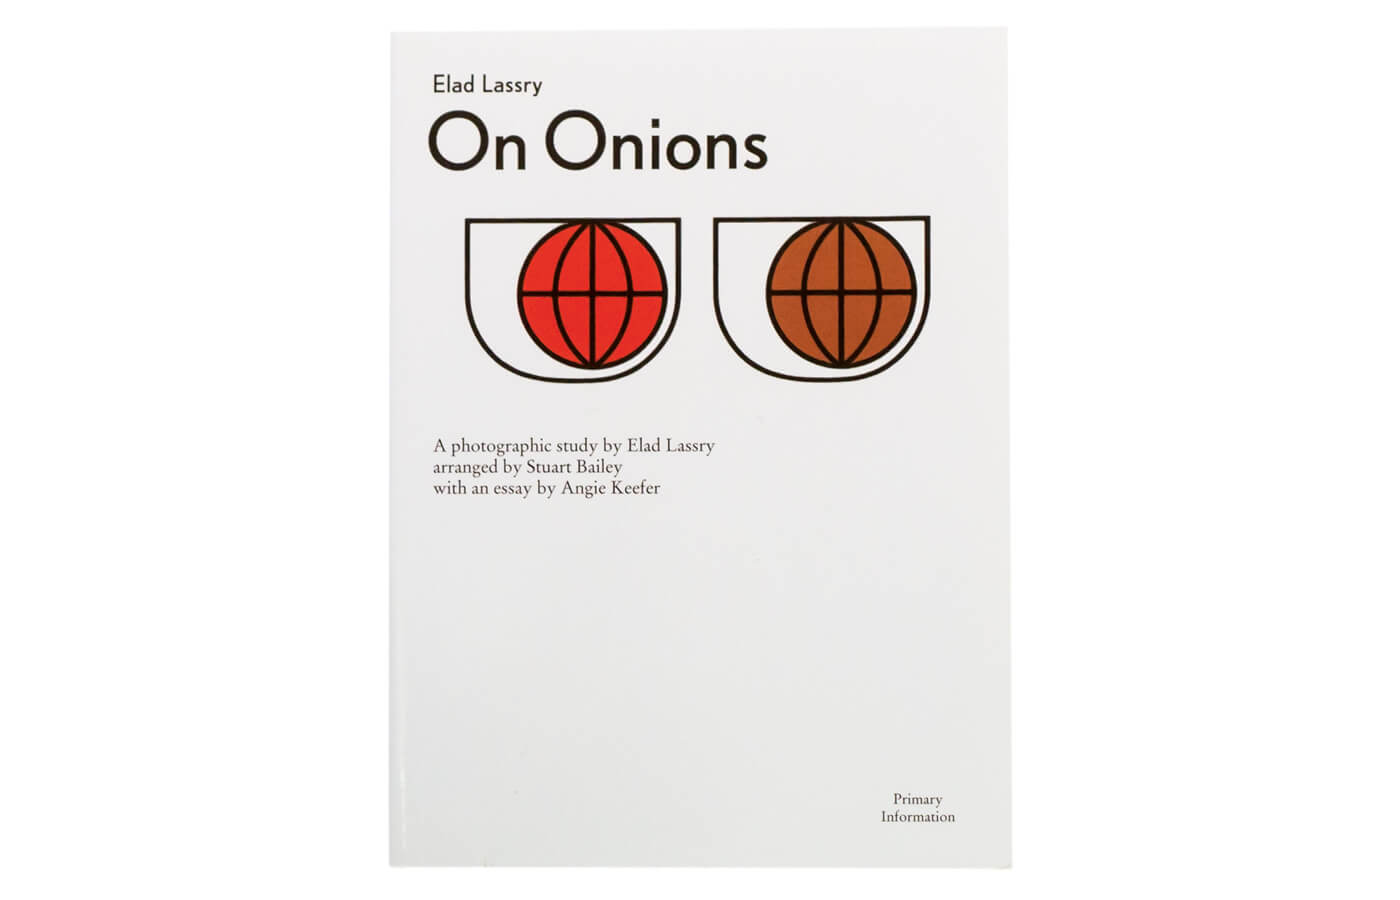 On Onions